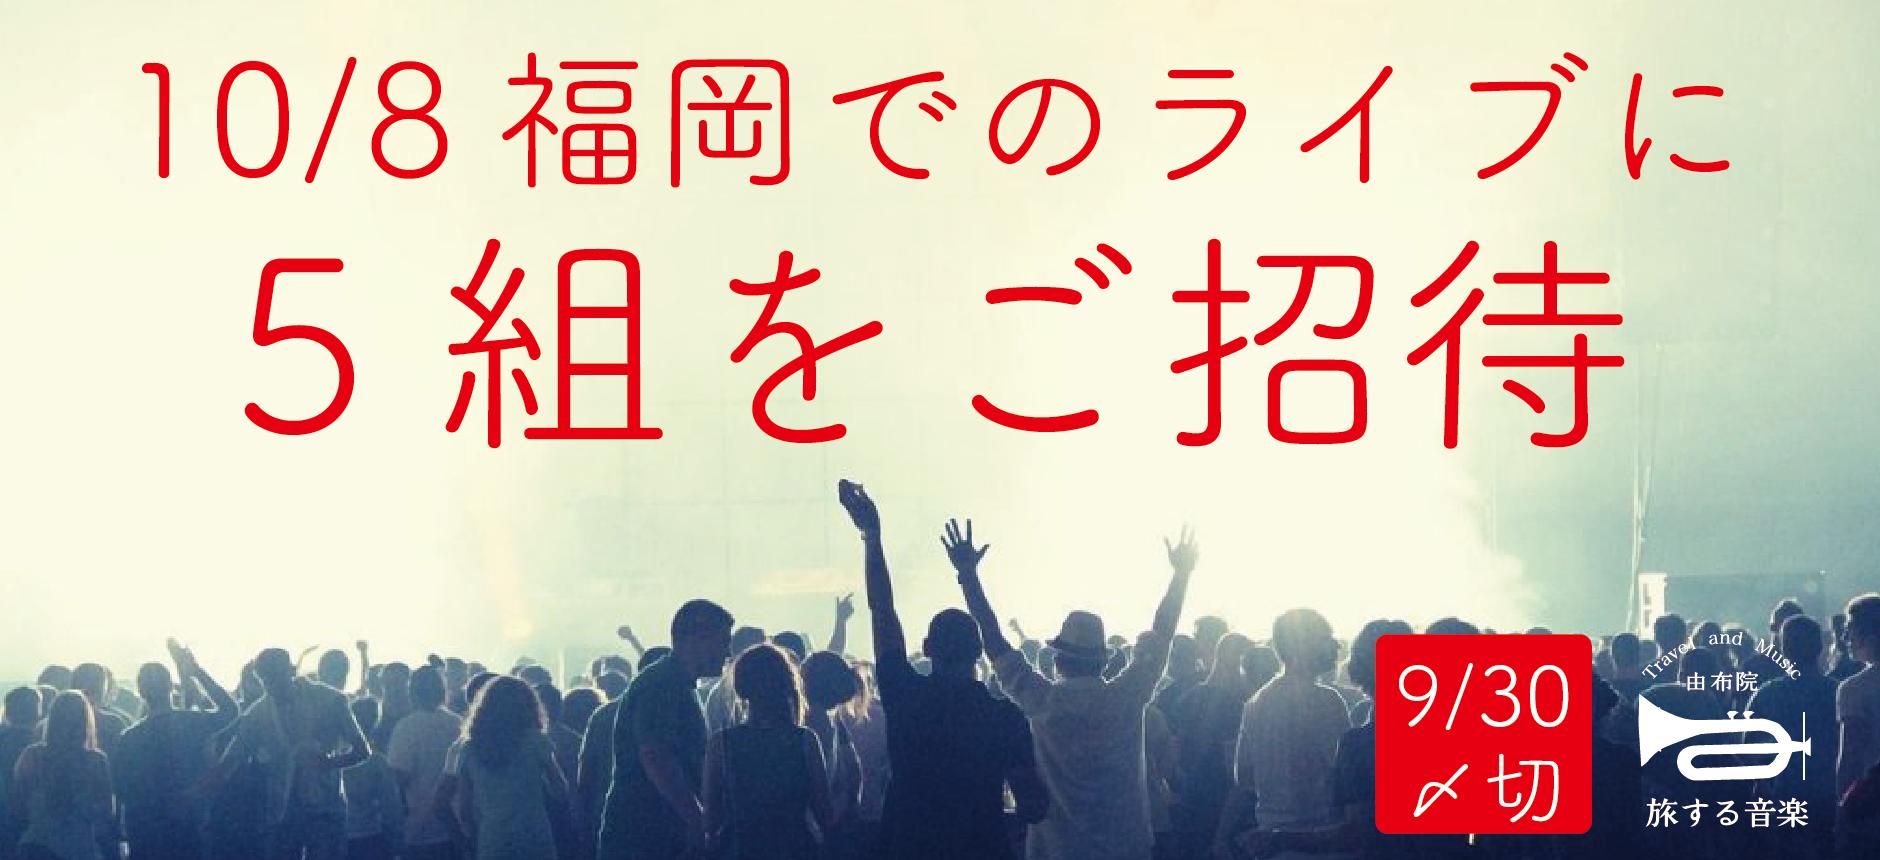 banner_1880-860_旅する音楽プレゼント0923